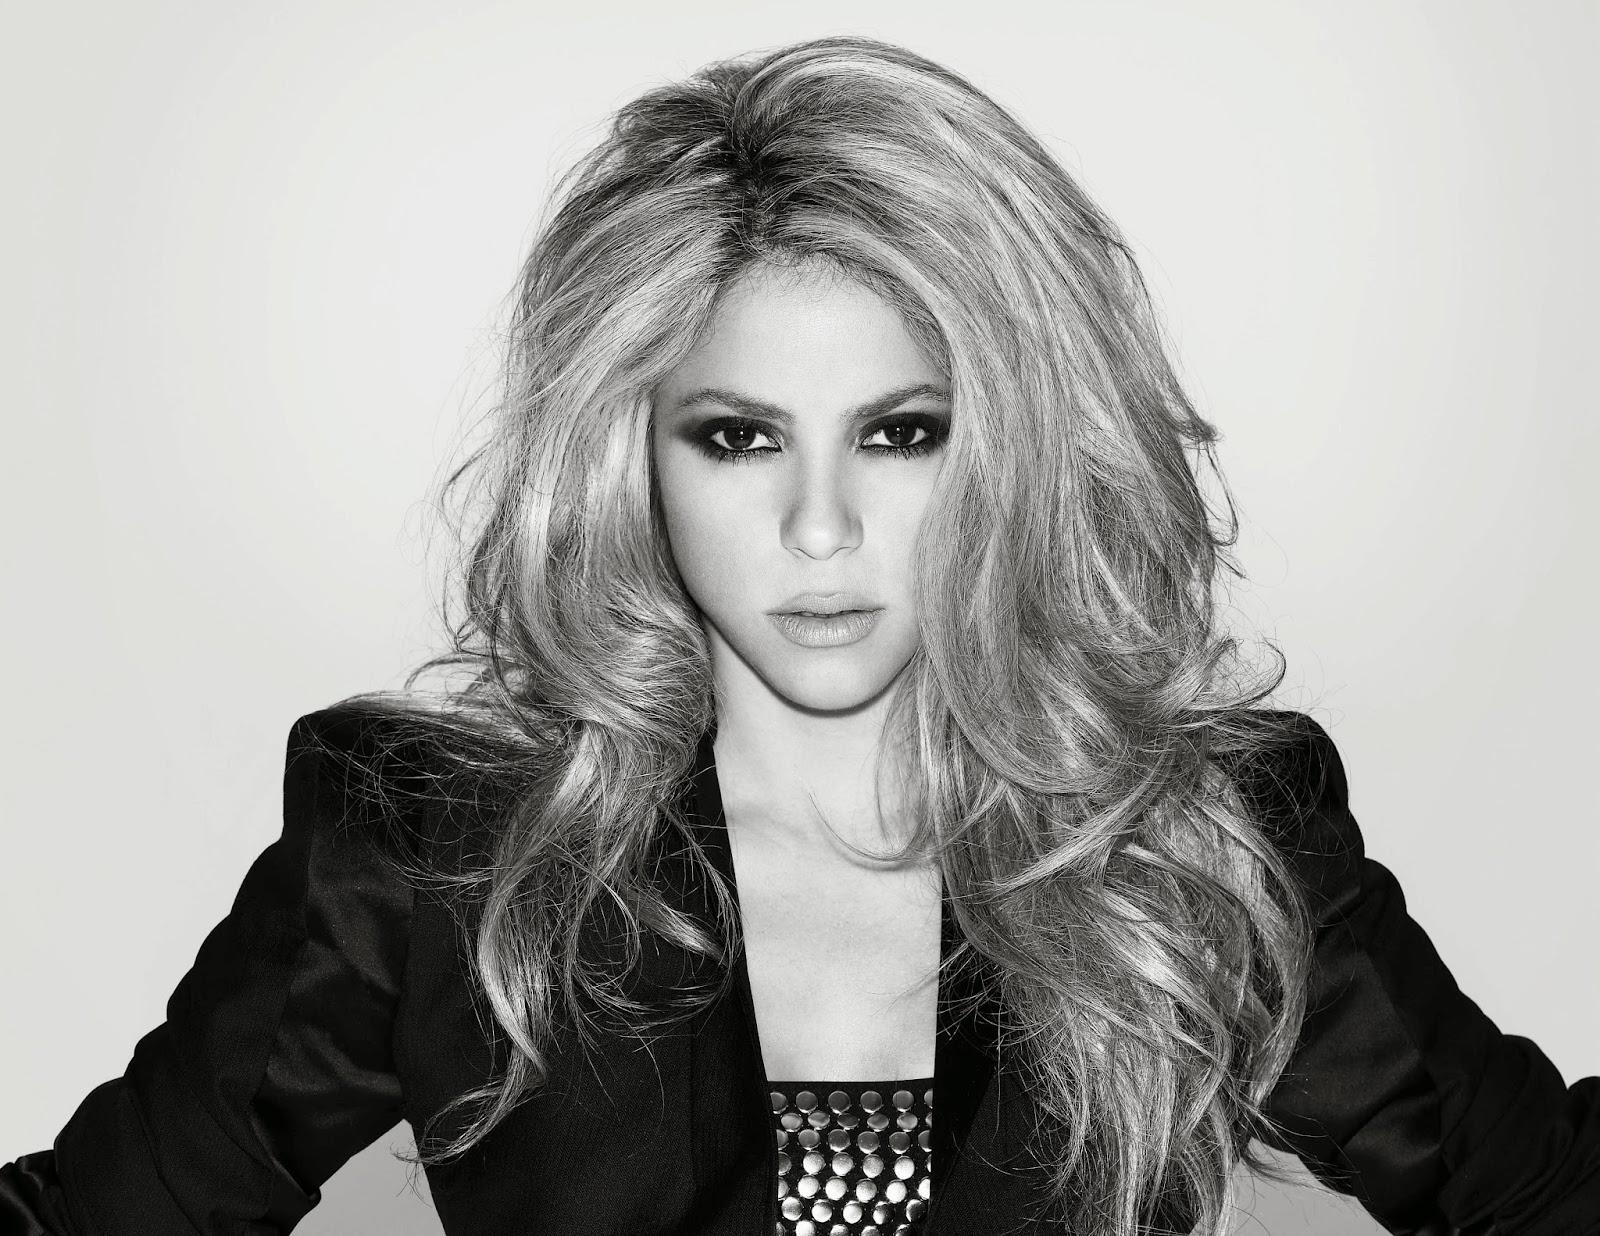 Shakira Famous Dancer expert and MUsic Performer ~ Gossip ... Shakira